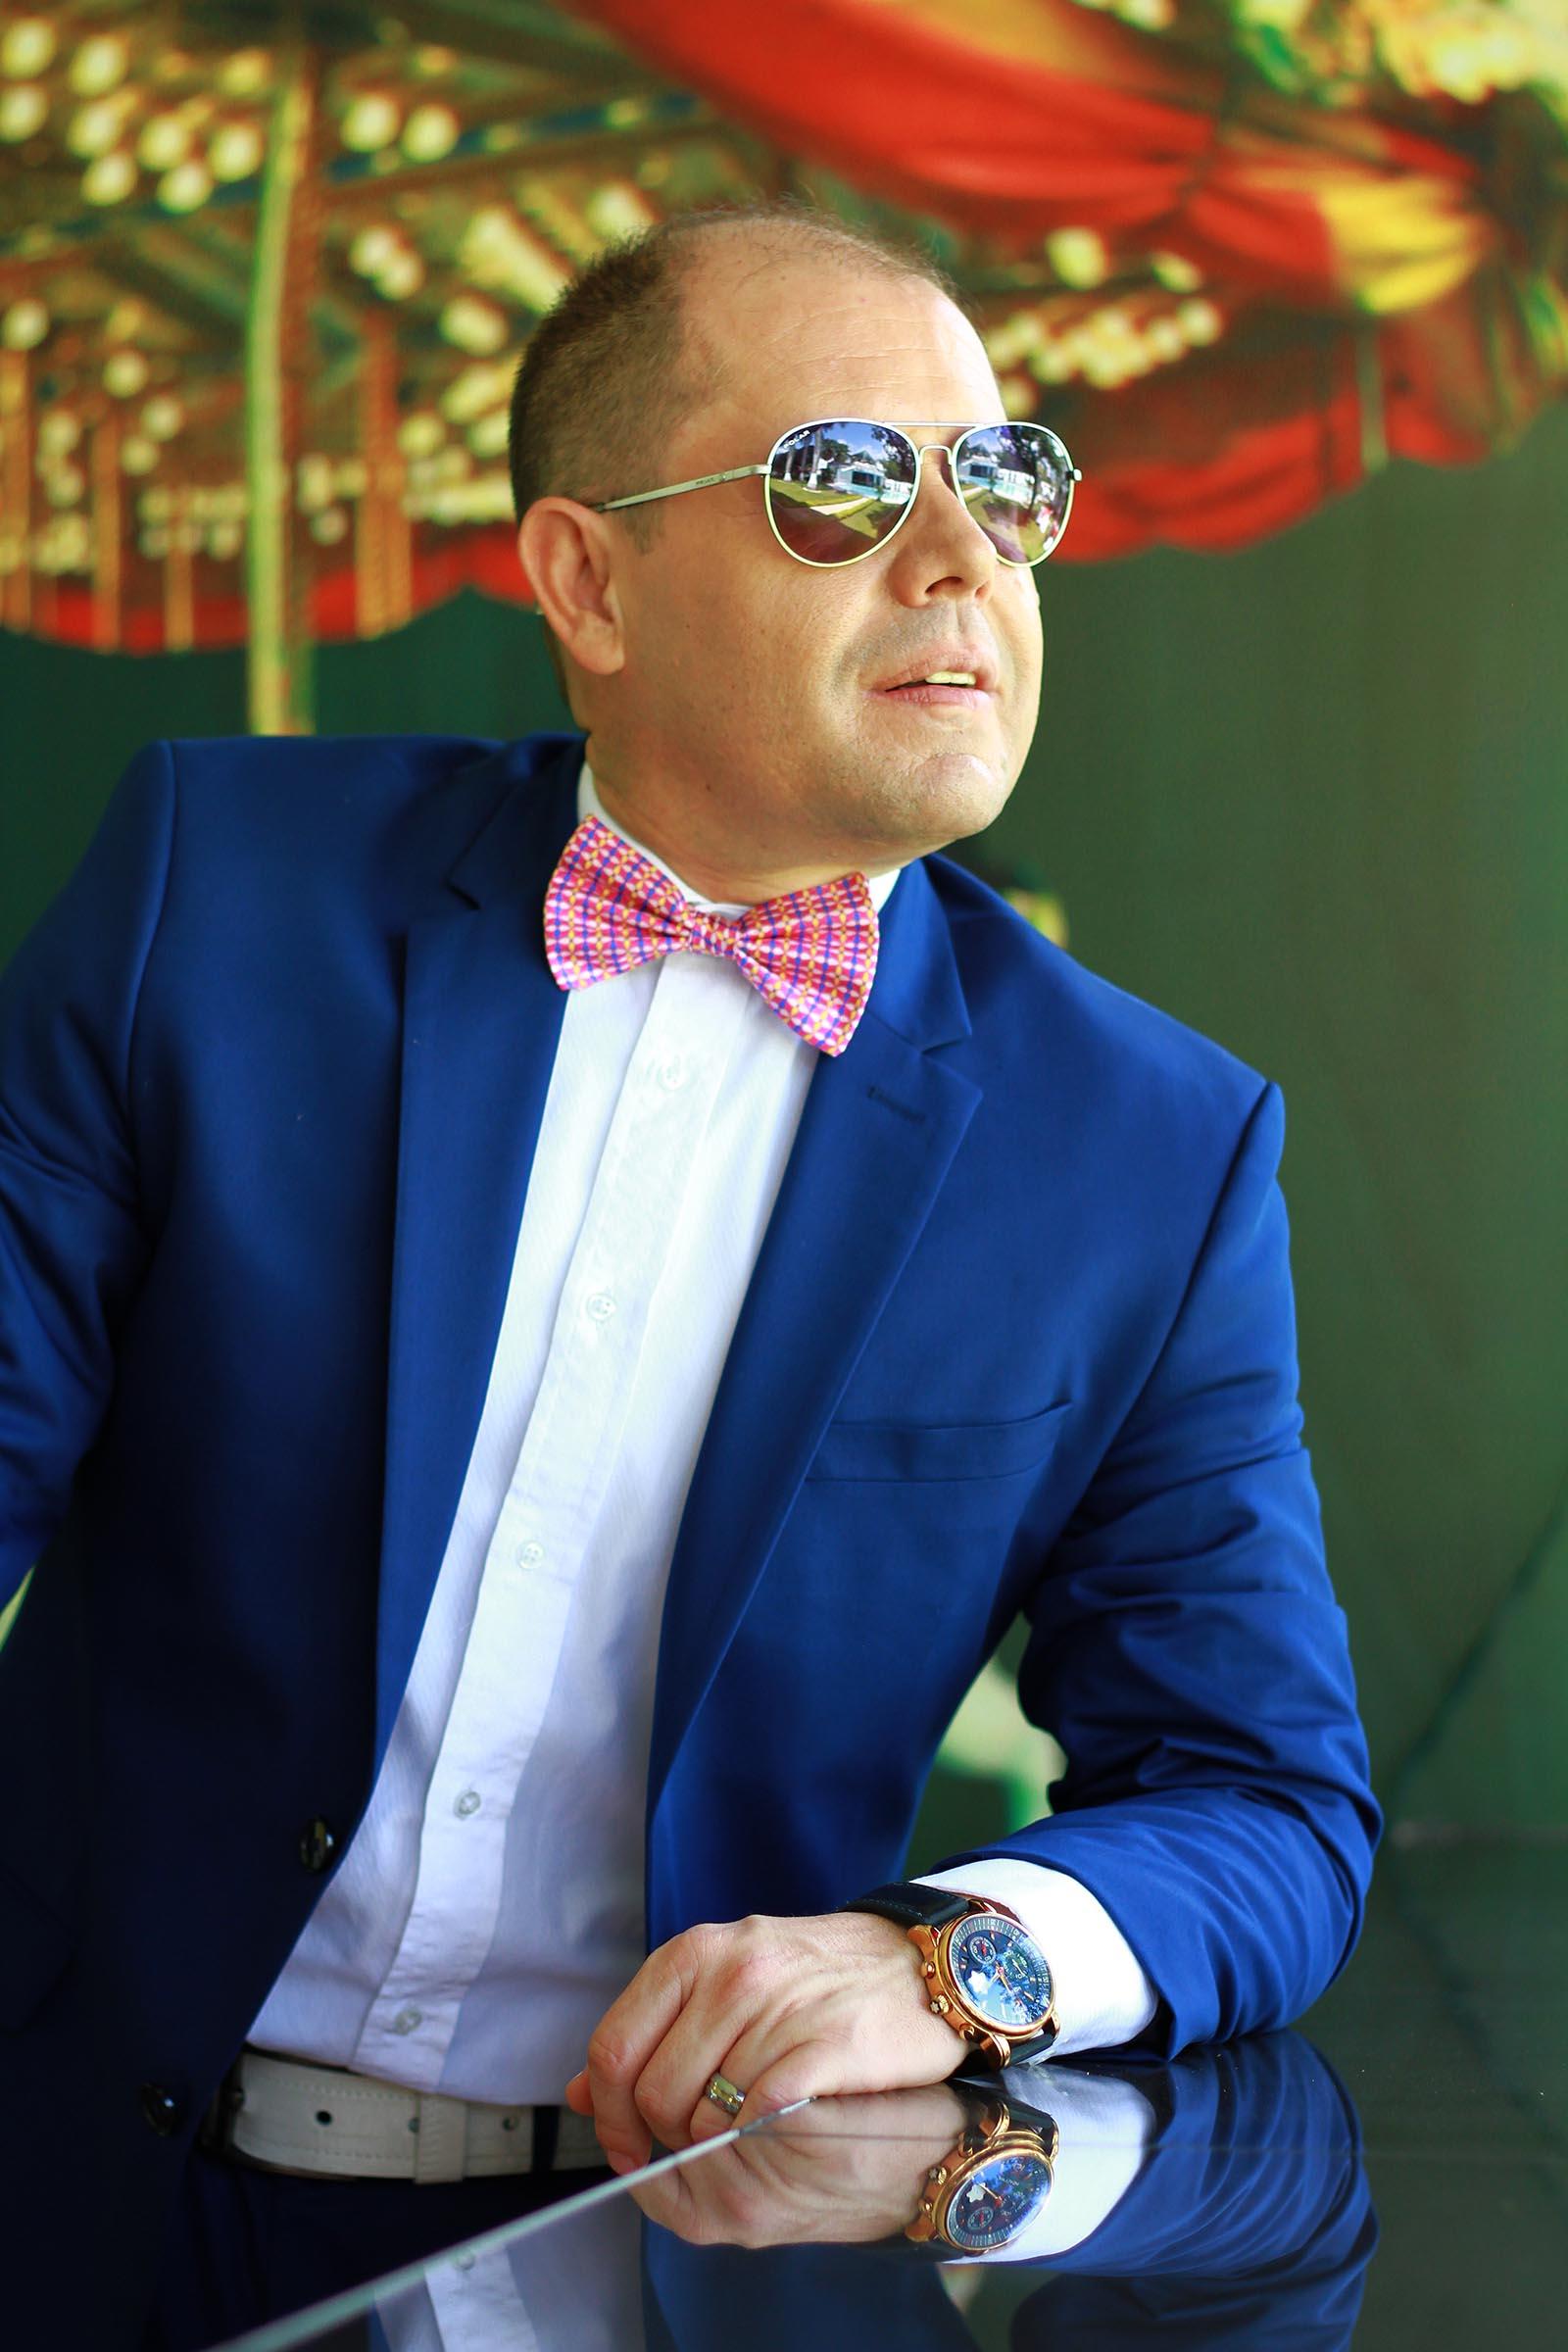 Hector Jimenez - 42 - Quién es Héctor Jimenez R 2020